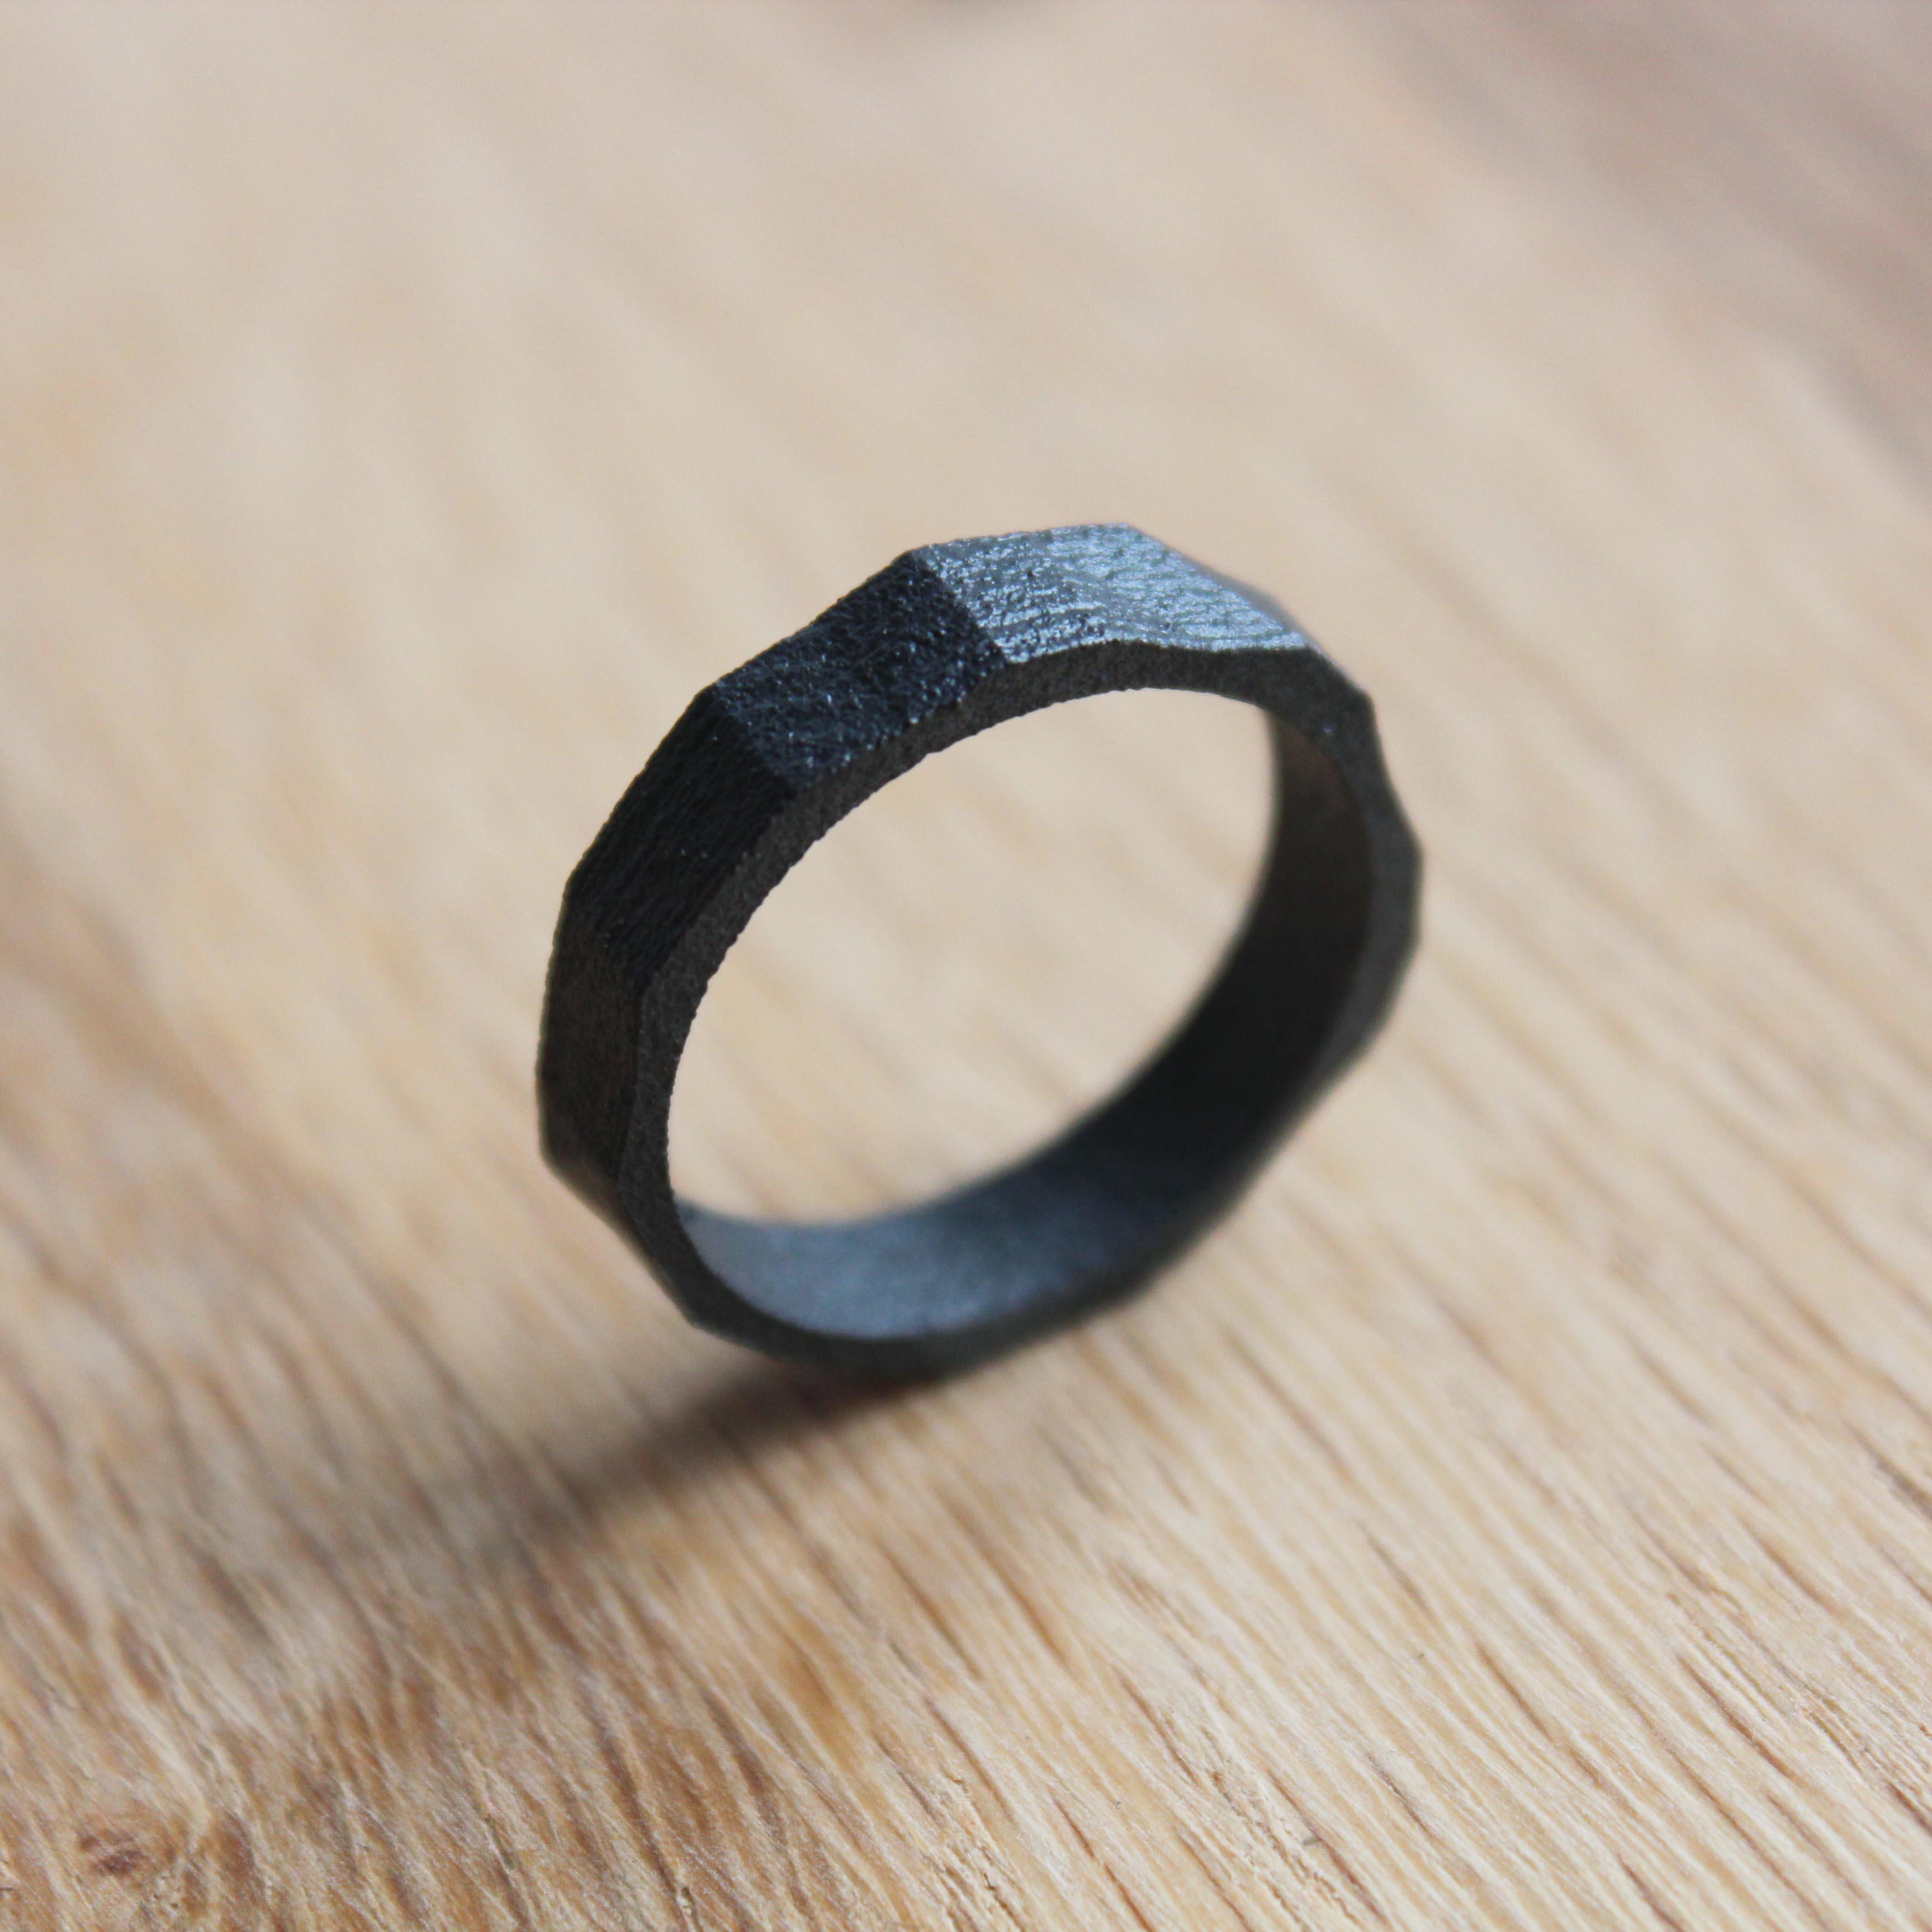 Brimir - Matte Black Viking jewelry ring band